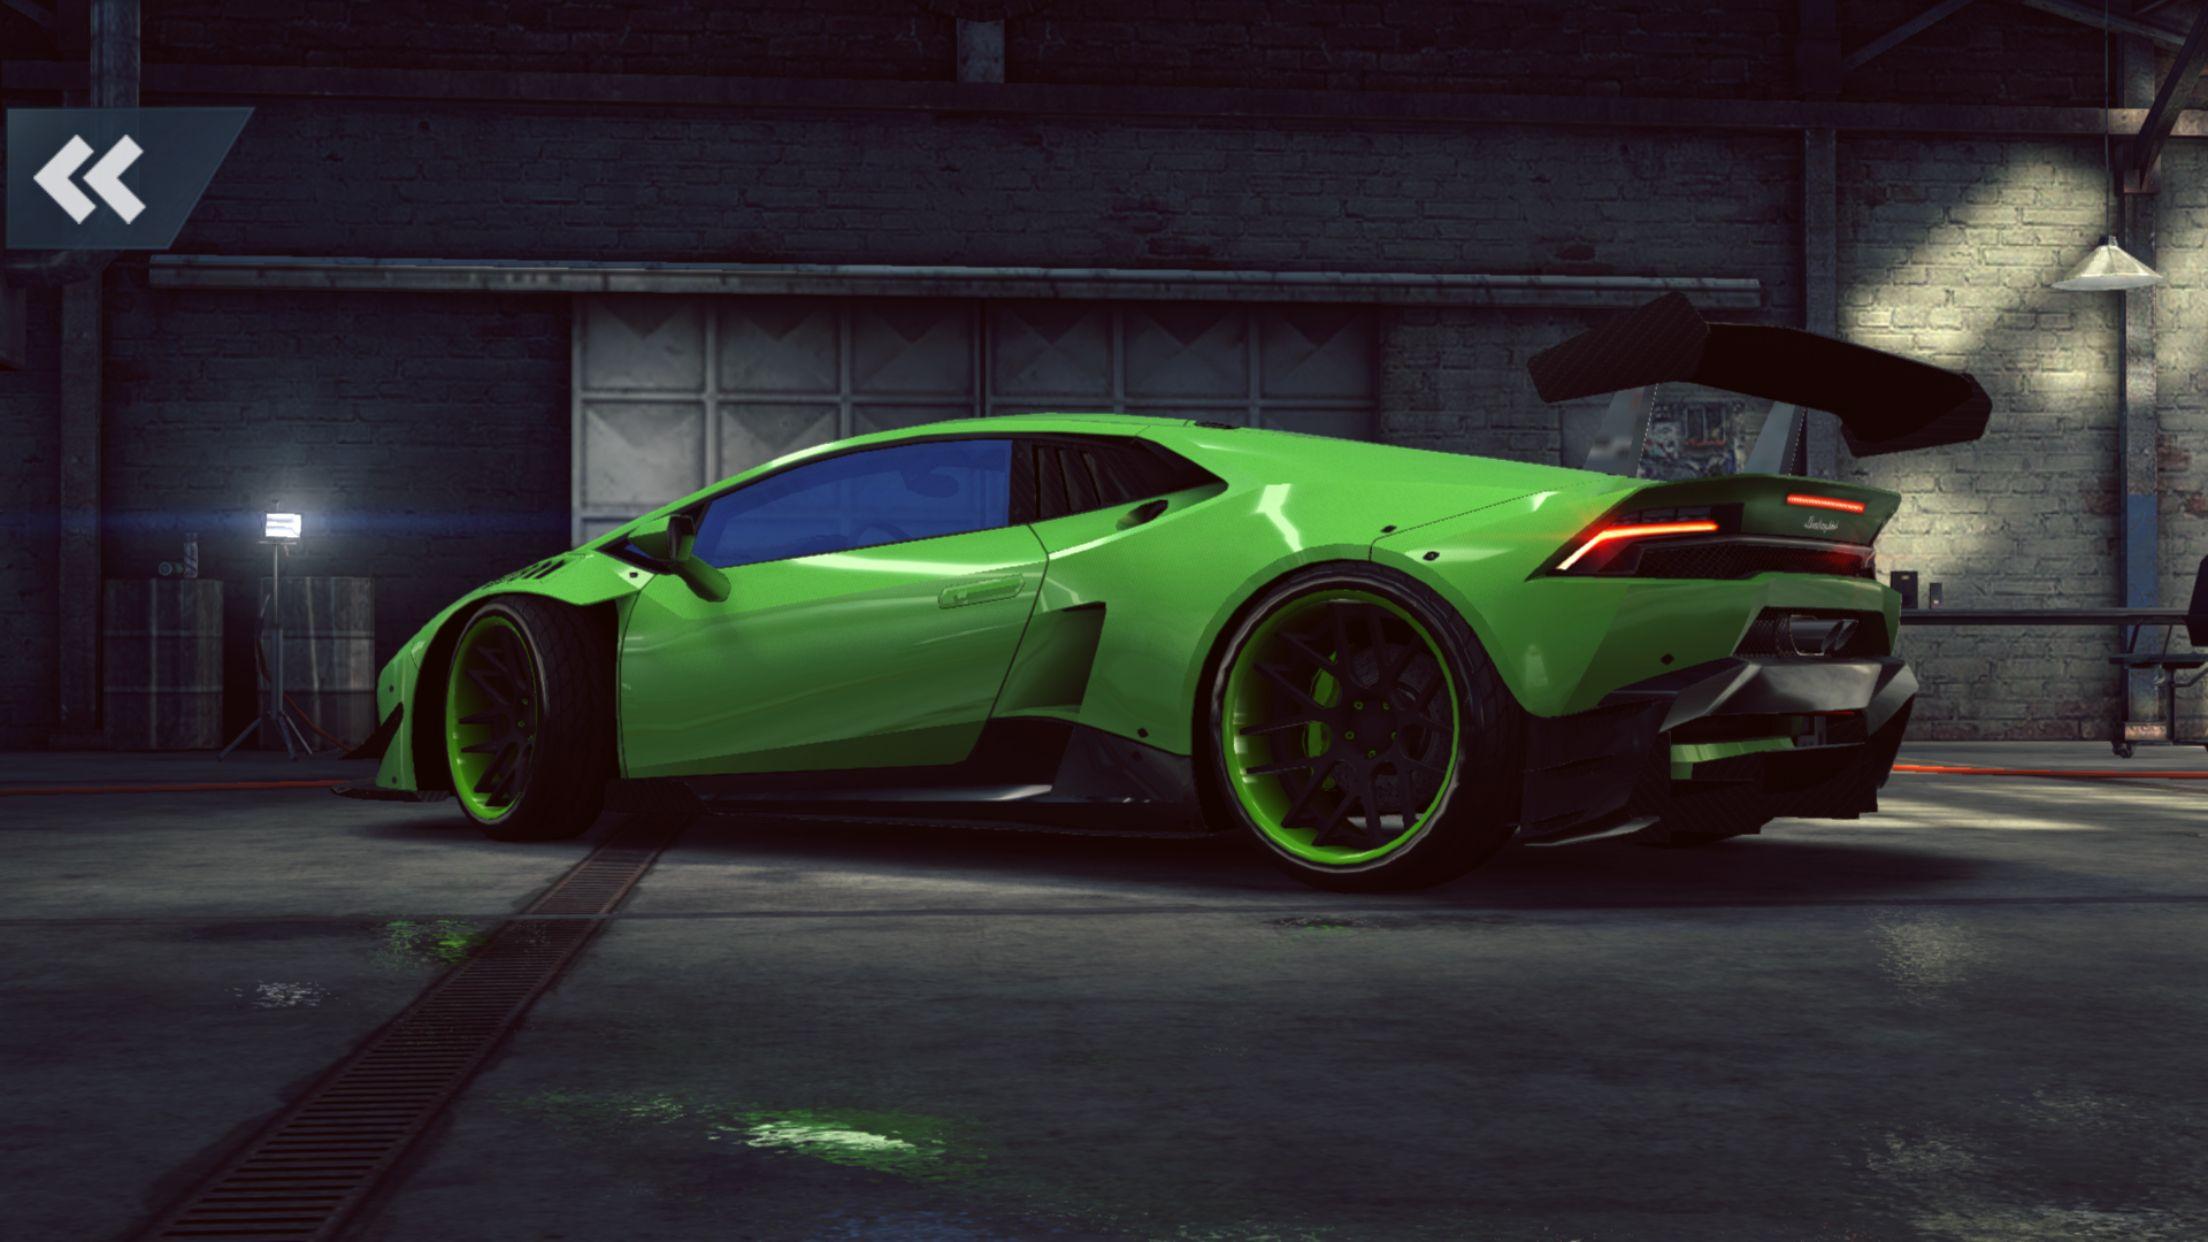 3be180ba04a844b9e6999573454c21ce Extraordinary Lamborghini Huracan Need for Speed Cars Trend